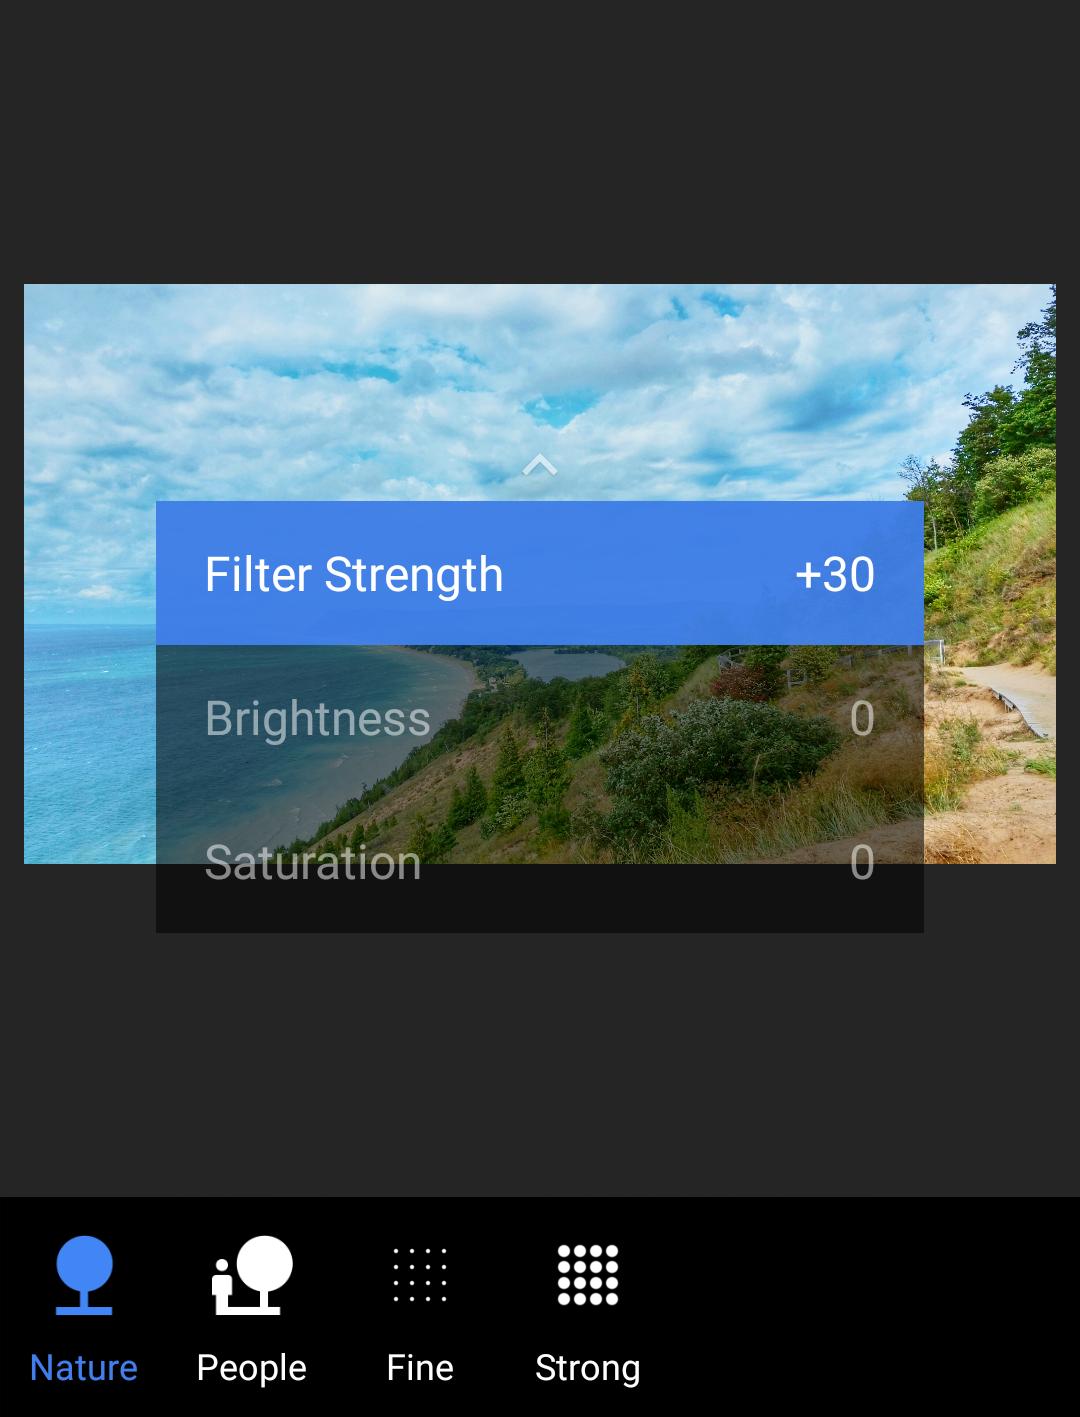 Photo editing apps for travel: Beginner's tutorial for